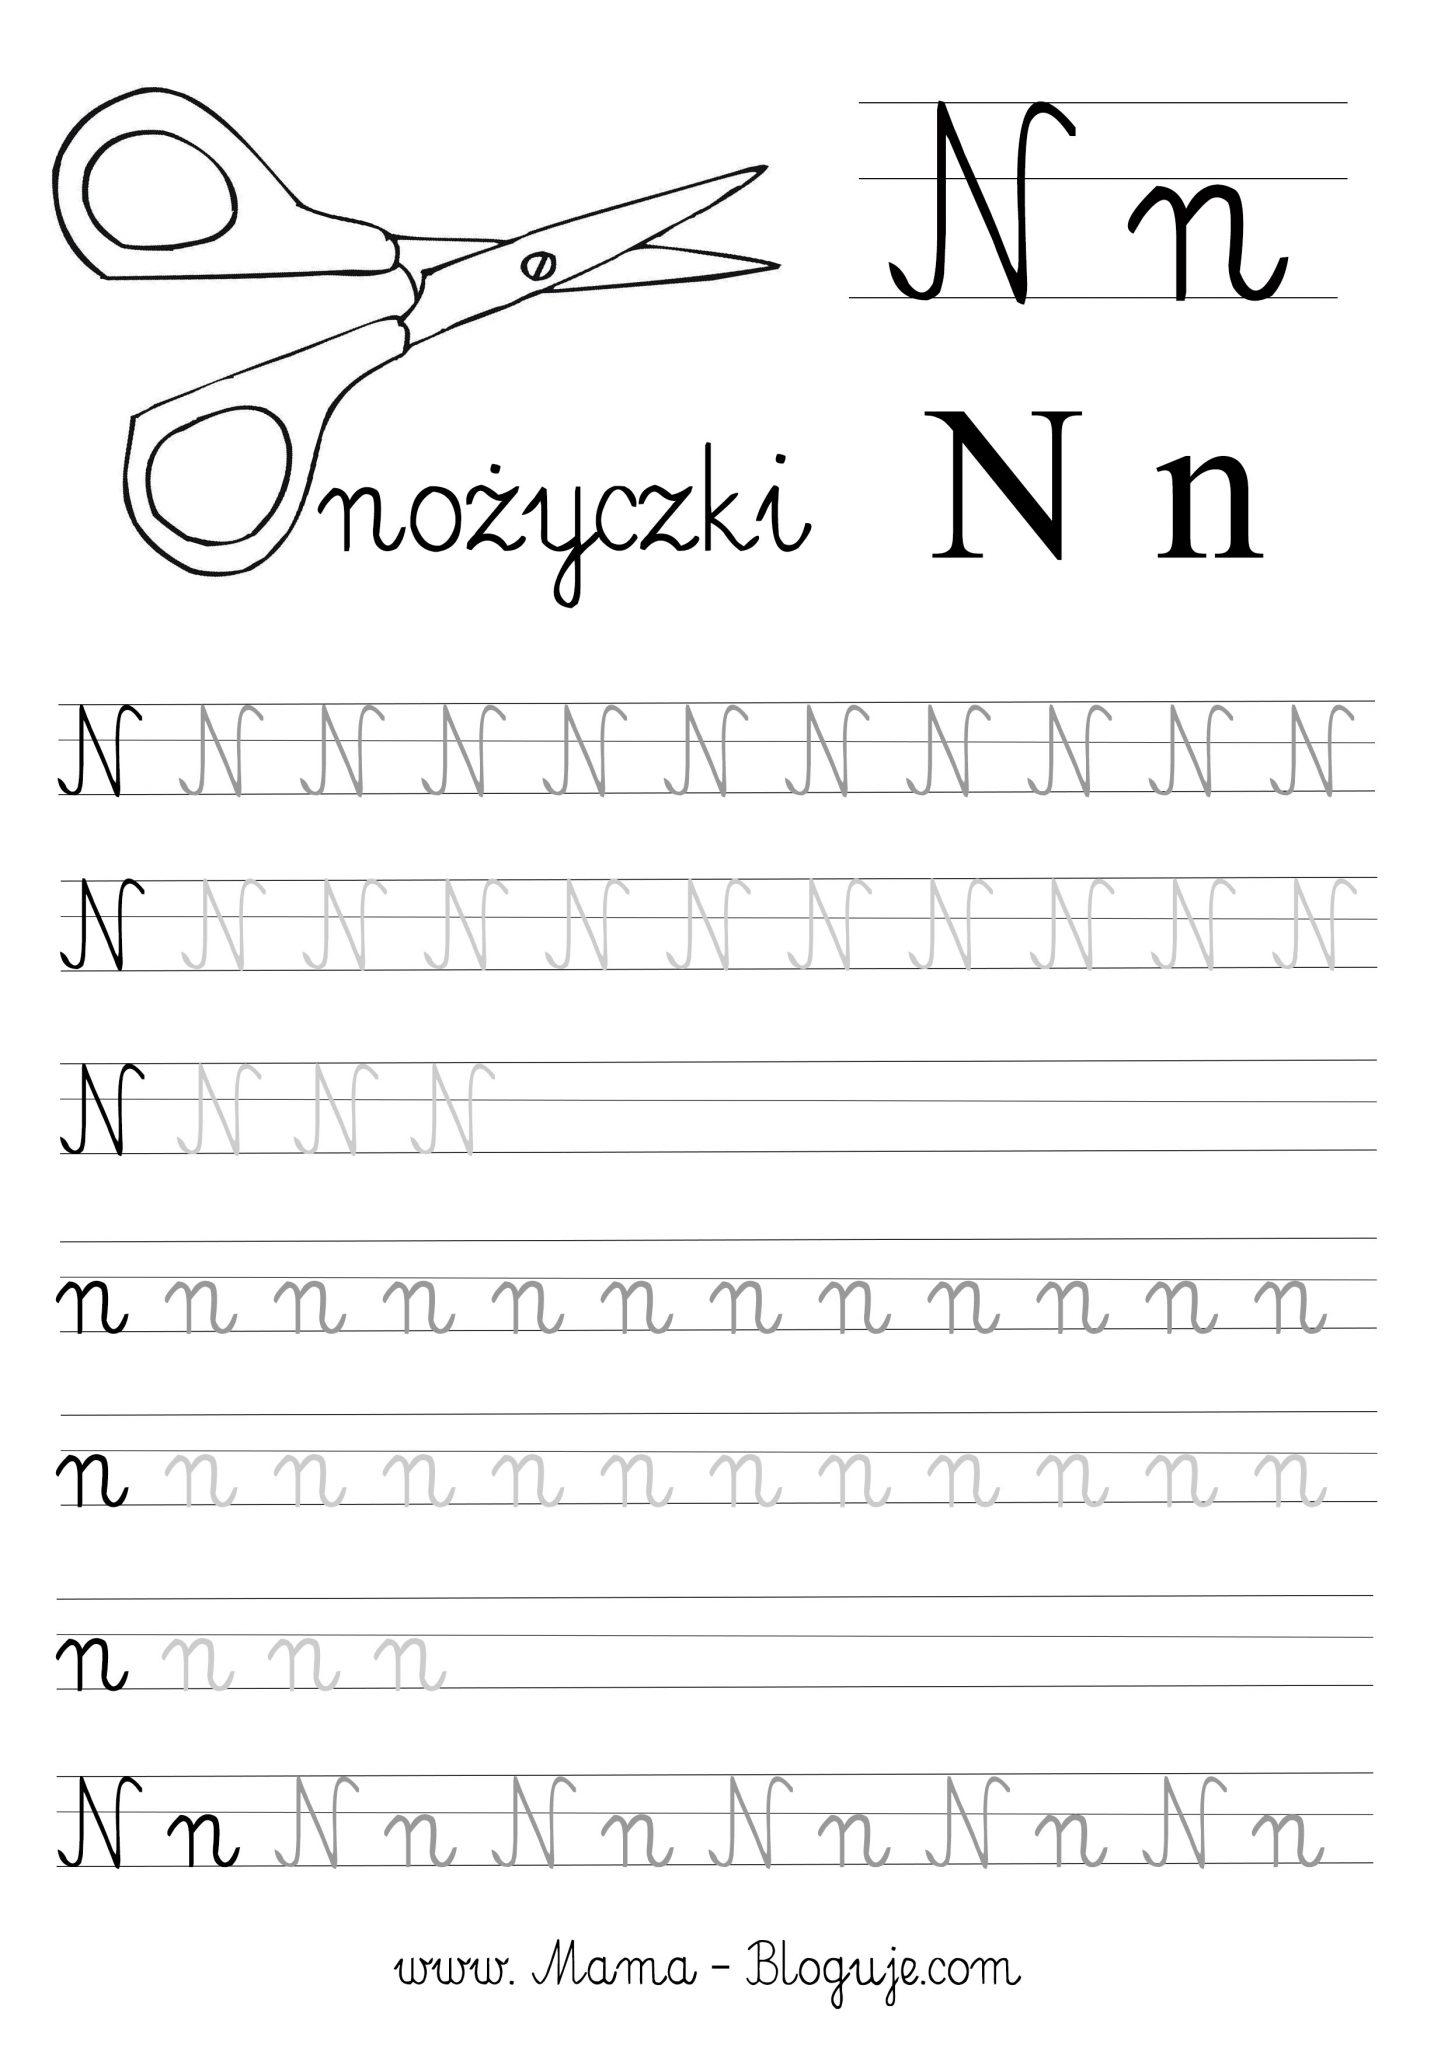 Literka n nauka pisania - SZABLONY DO NAUKI PISANIA LITER - LITERKI M - Z